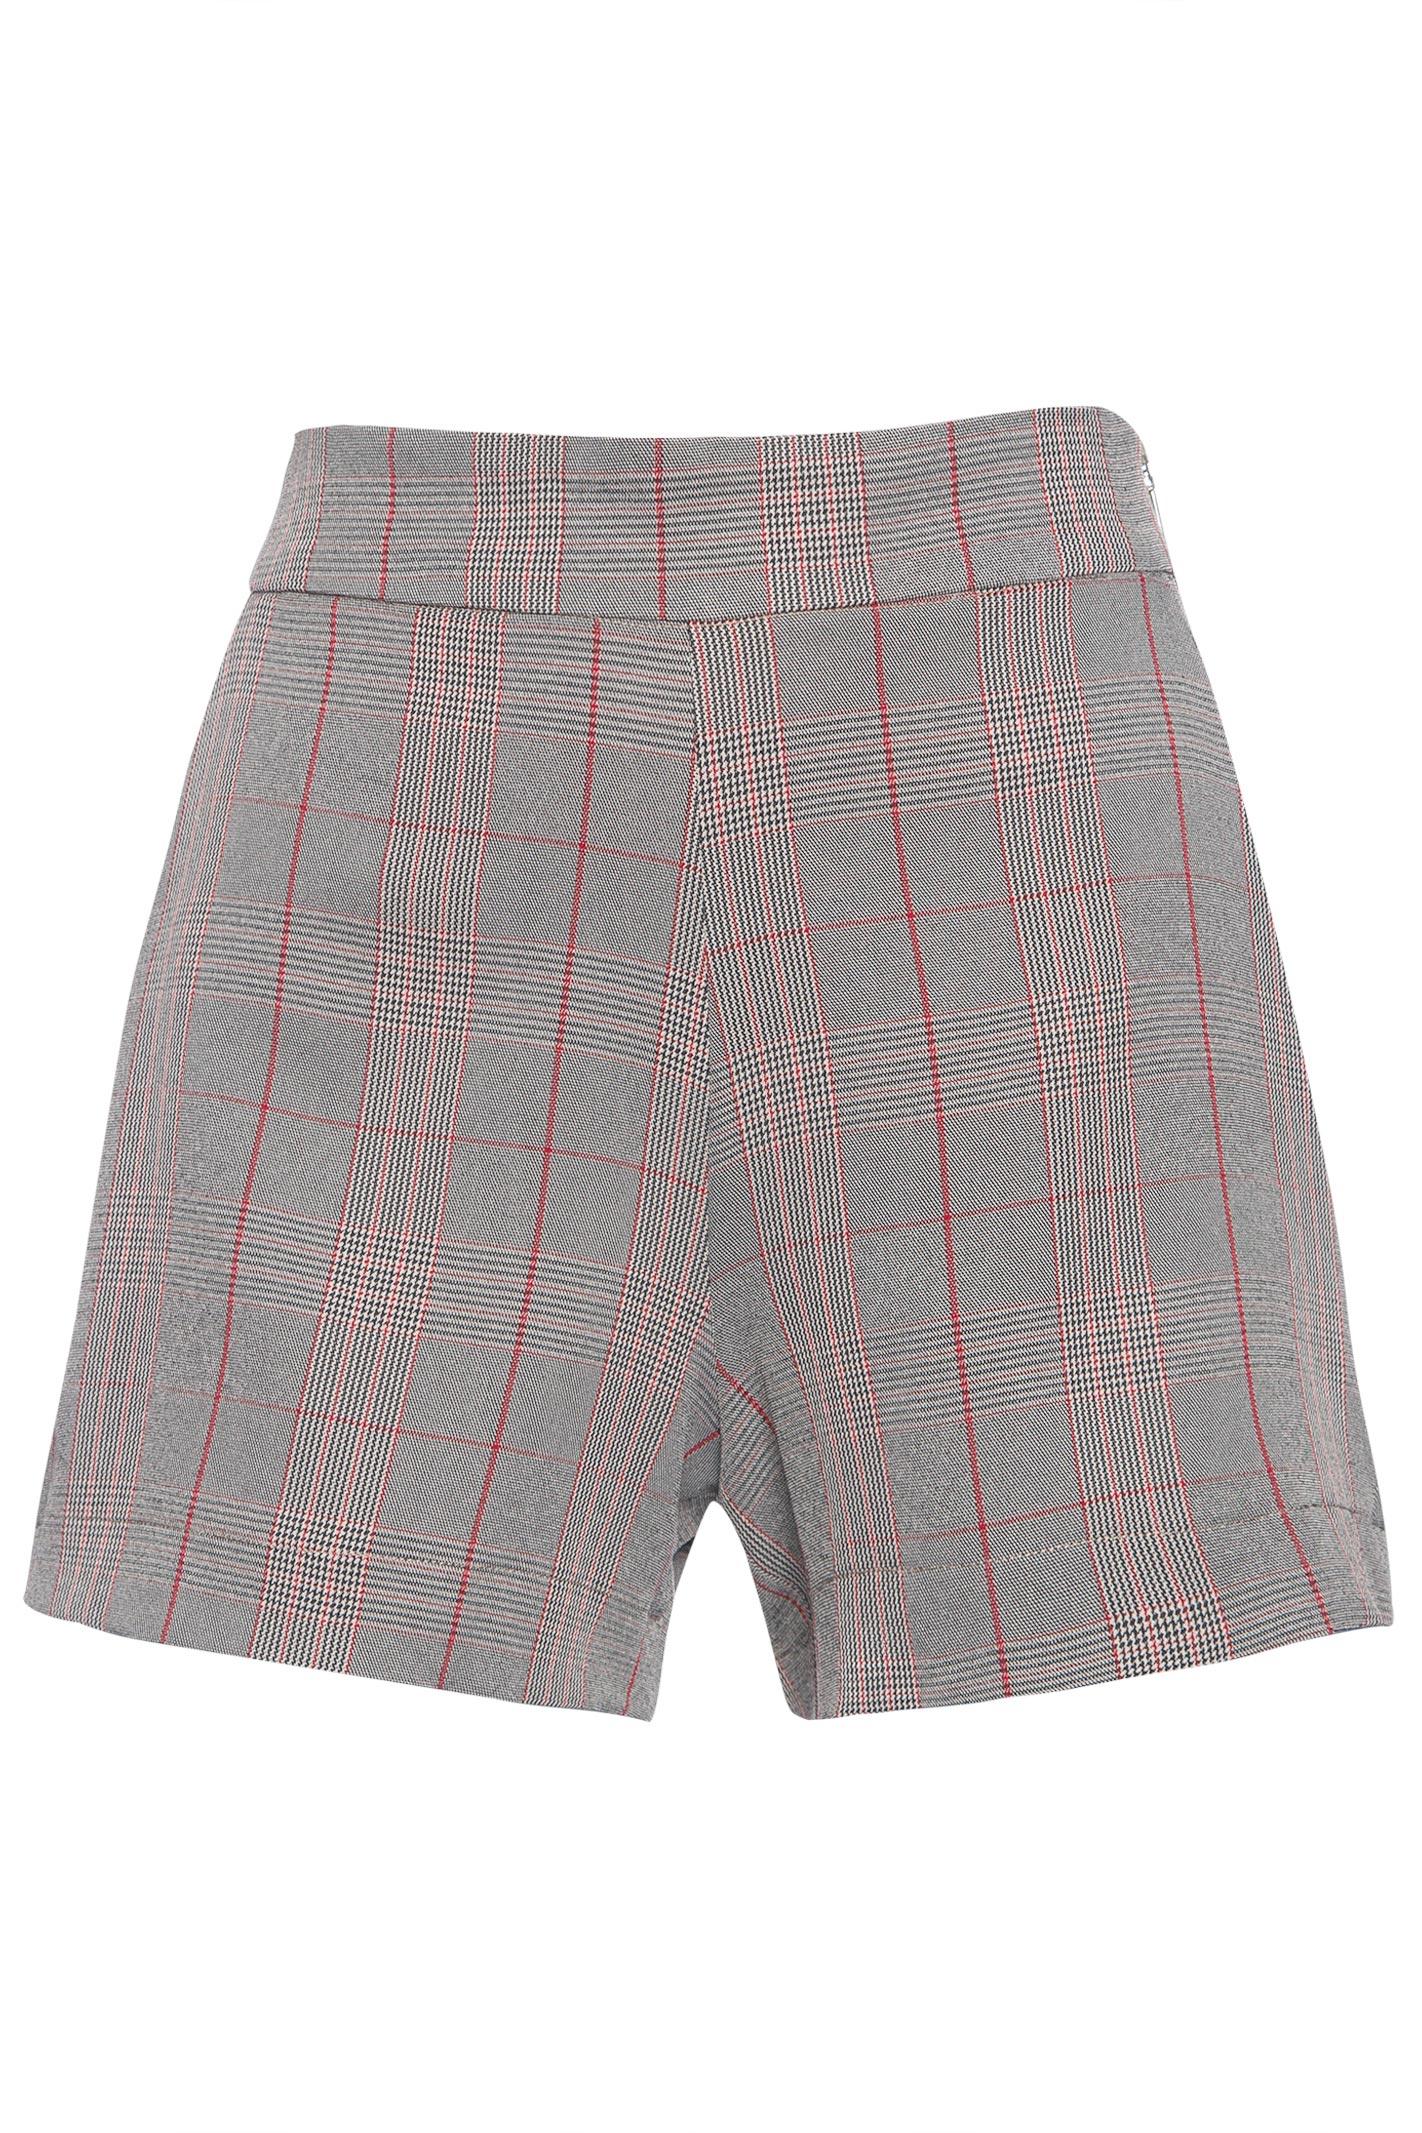 Shorts Curto Alfaiataria - Cinza